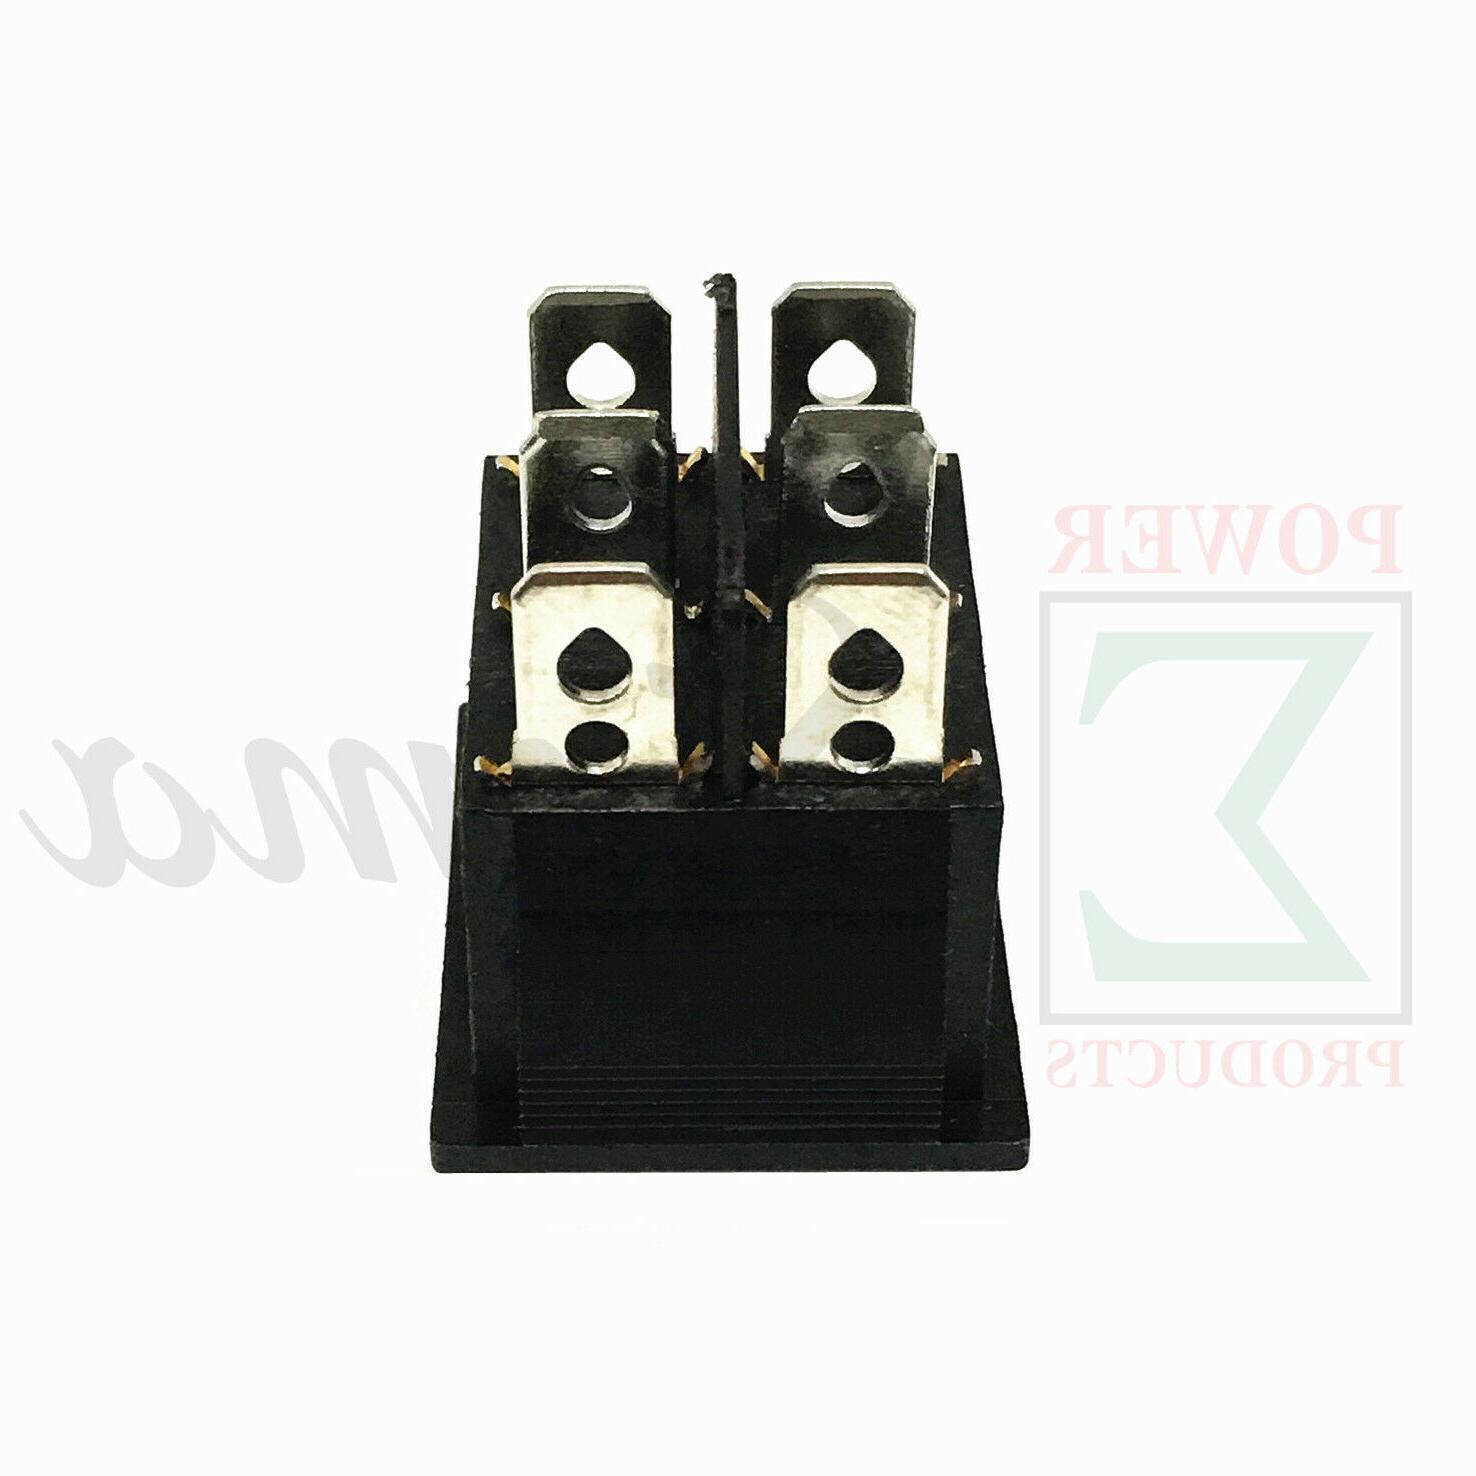 Start On For Power APGG10000 8000/10000 Watts Generator